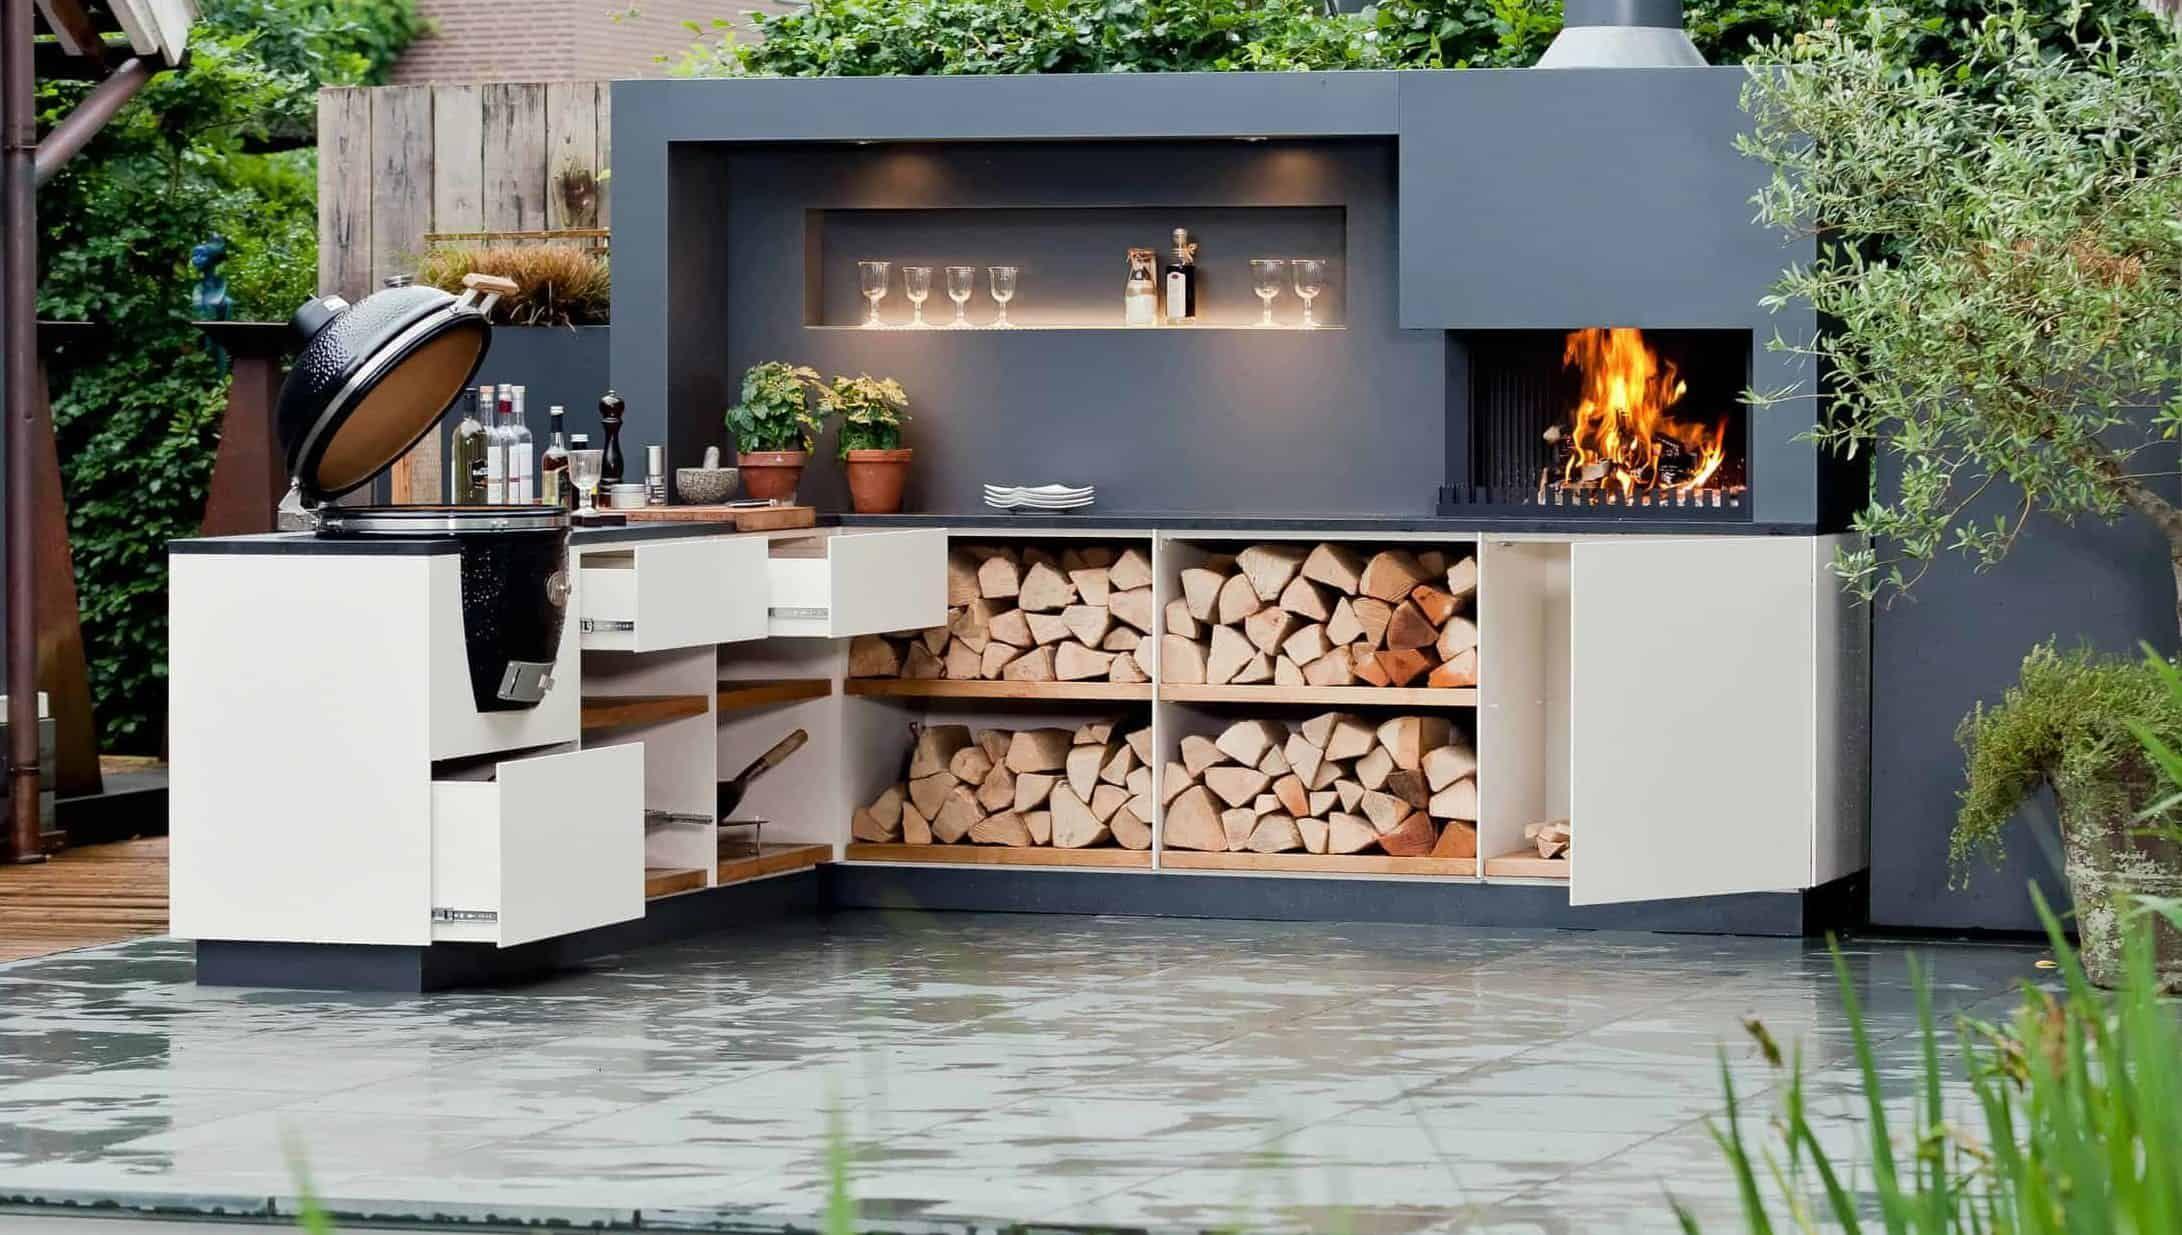 36 Beautiful Backyard Kitchen Ideas Stunning Backyard Kitchen Designs 2020 In 2020 Modular Outdoor Kitchens Outdoor Kitchen Design Diy Outdoor Kitchen